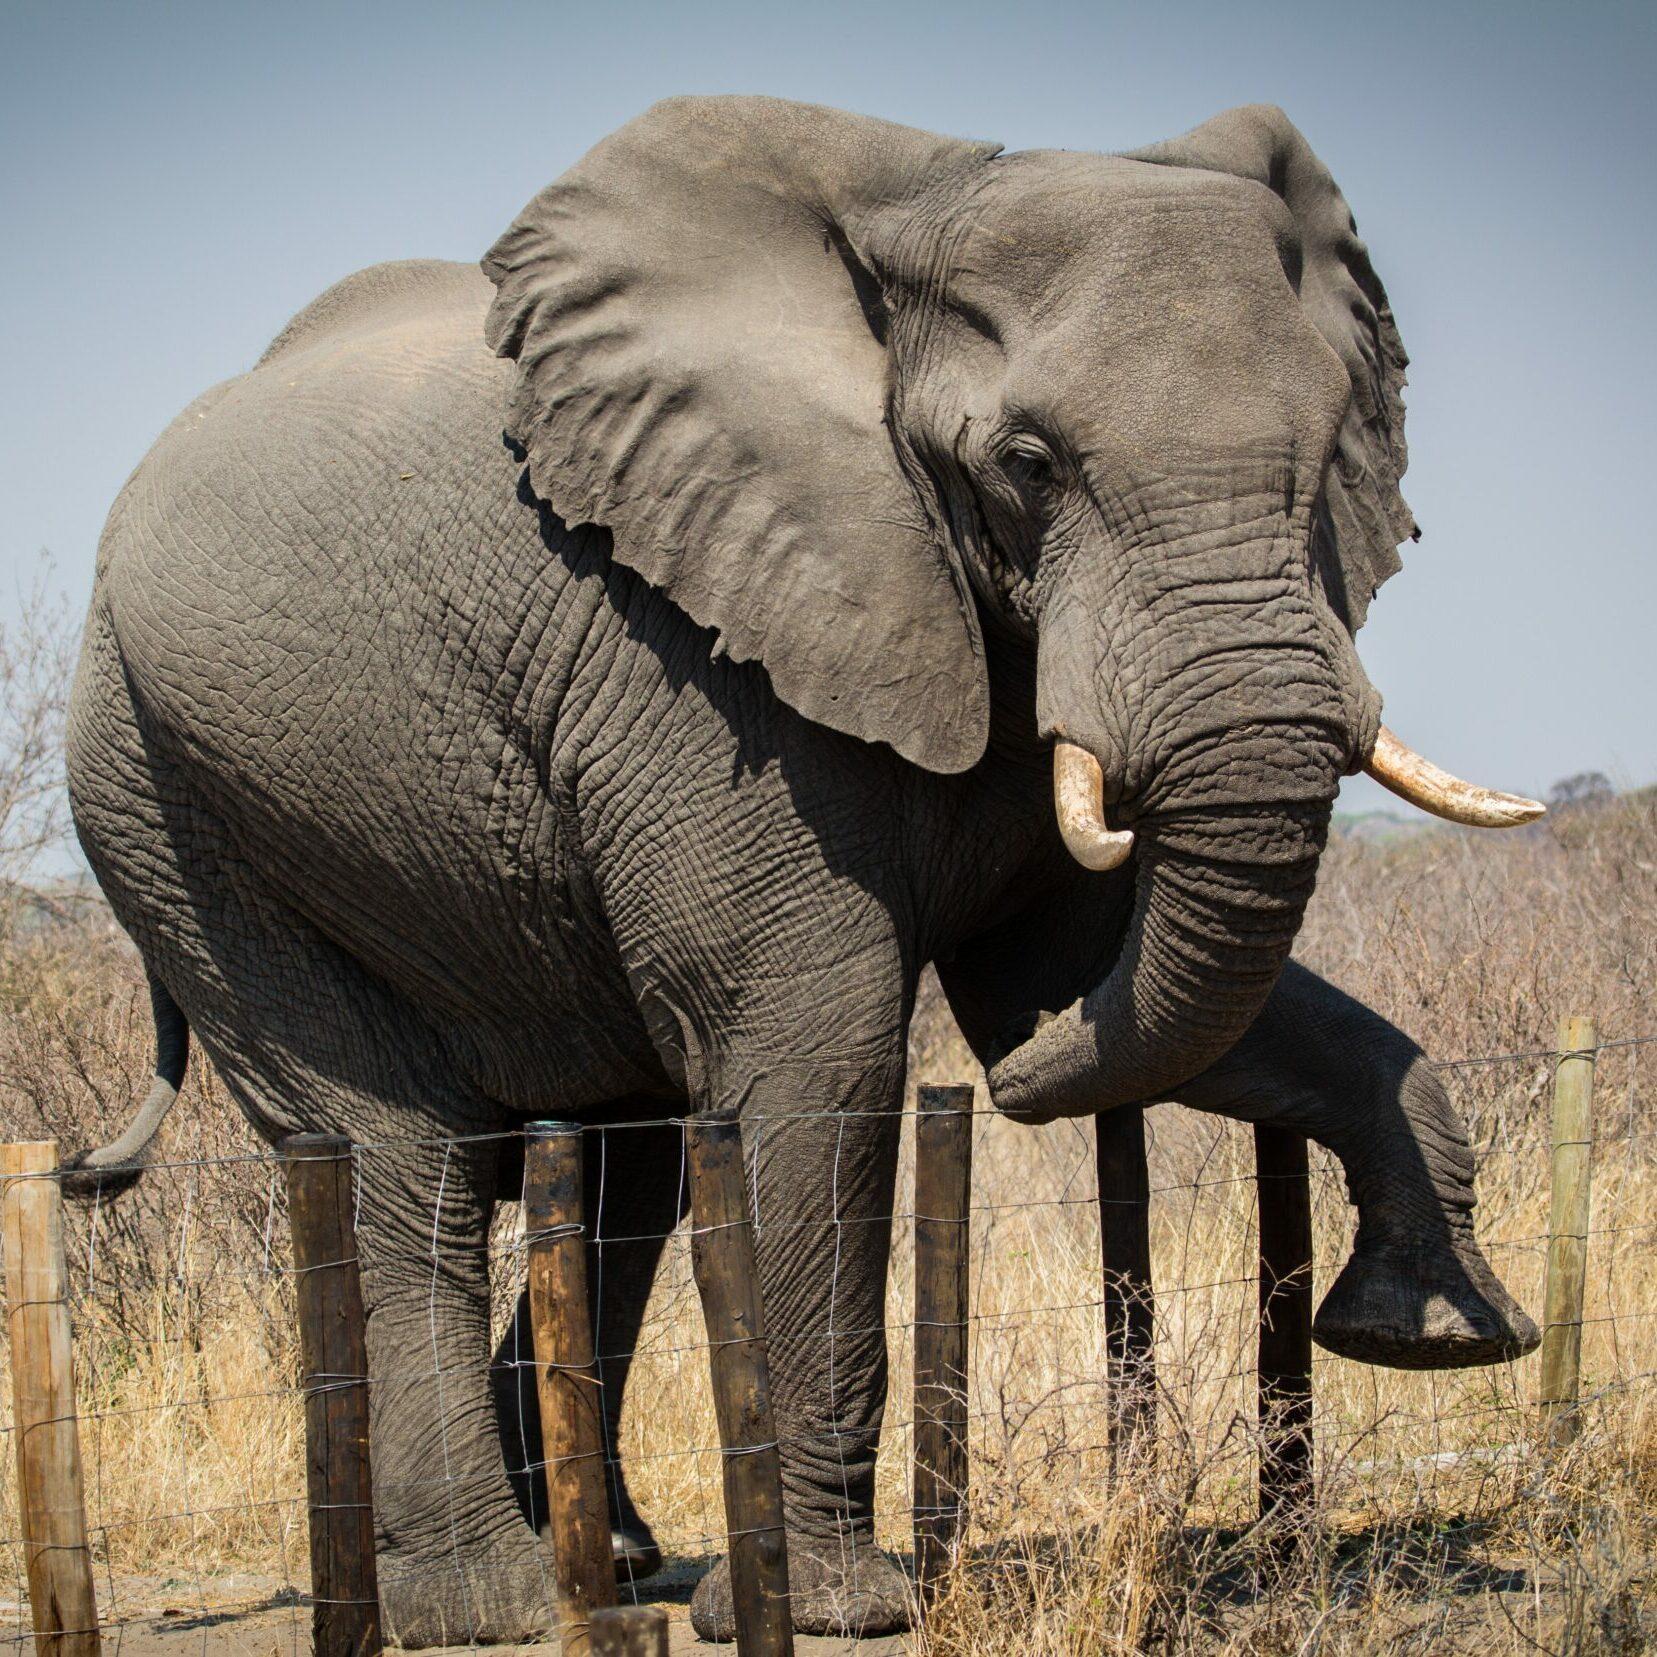 Elephant crossing human-made barrier